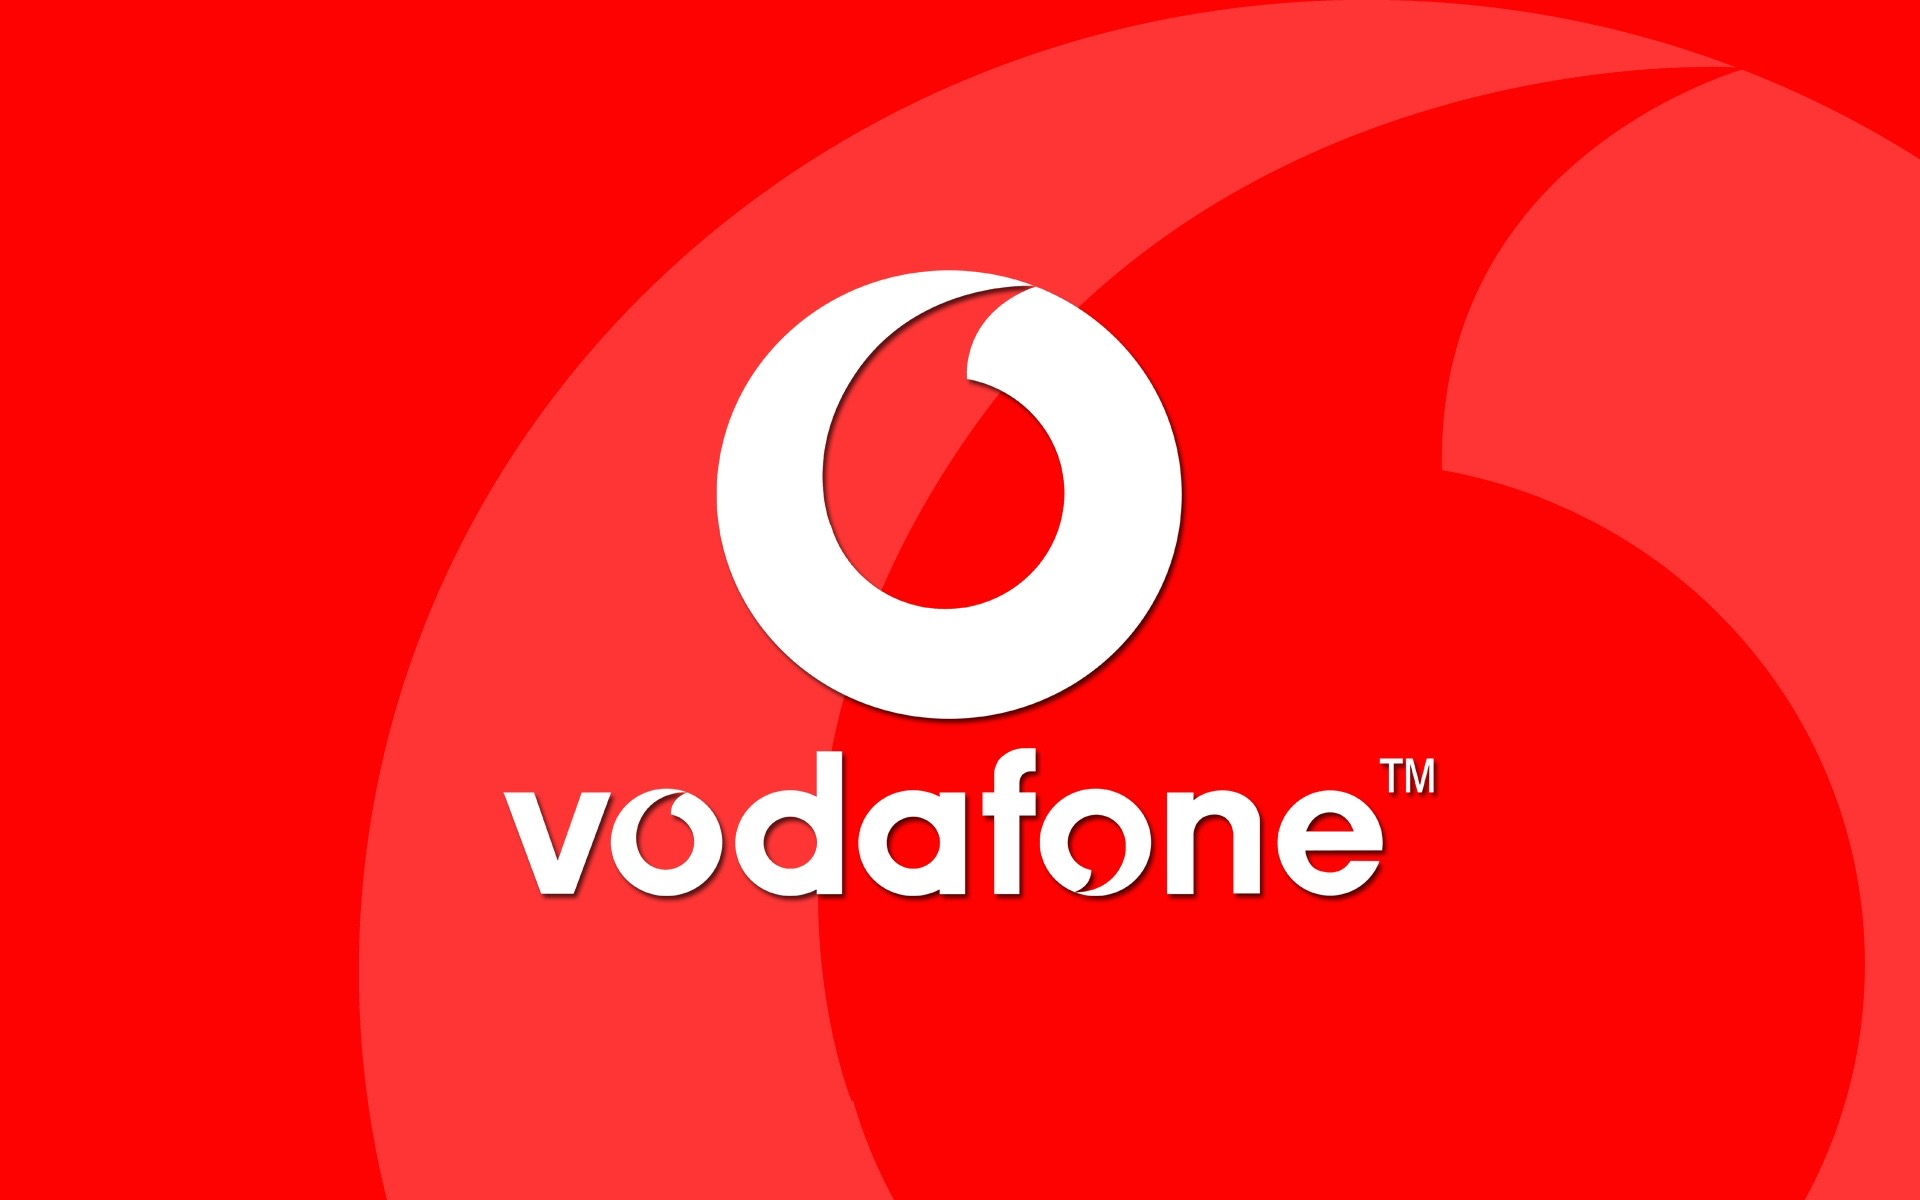 vodafone logo 0 0   tmonews